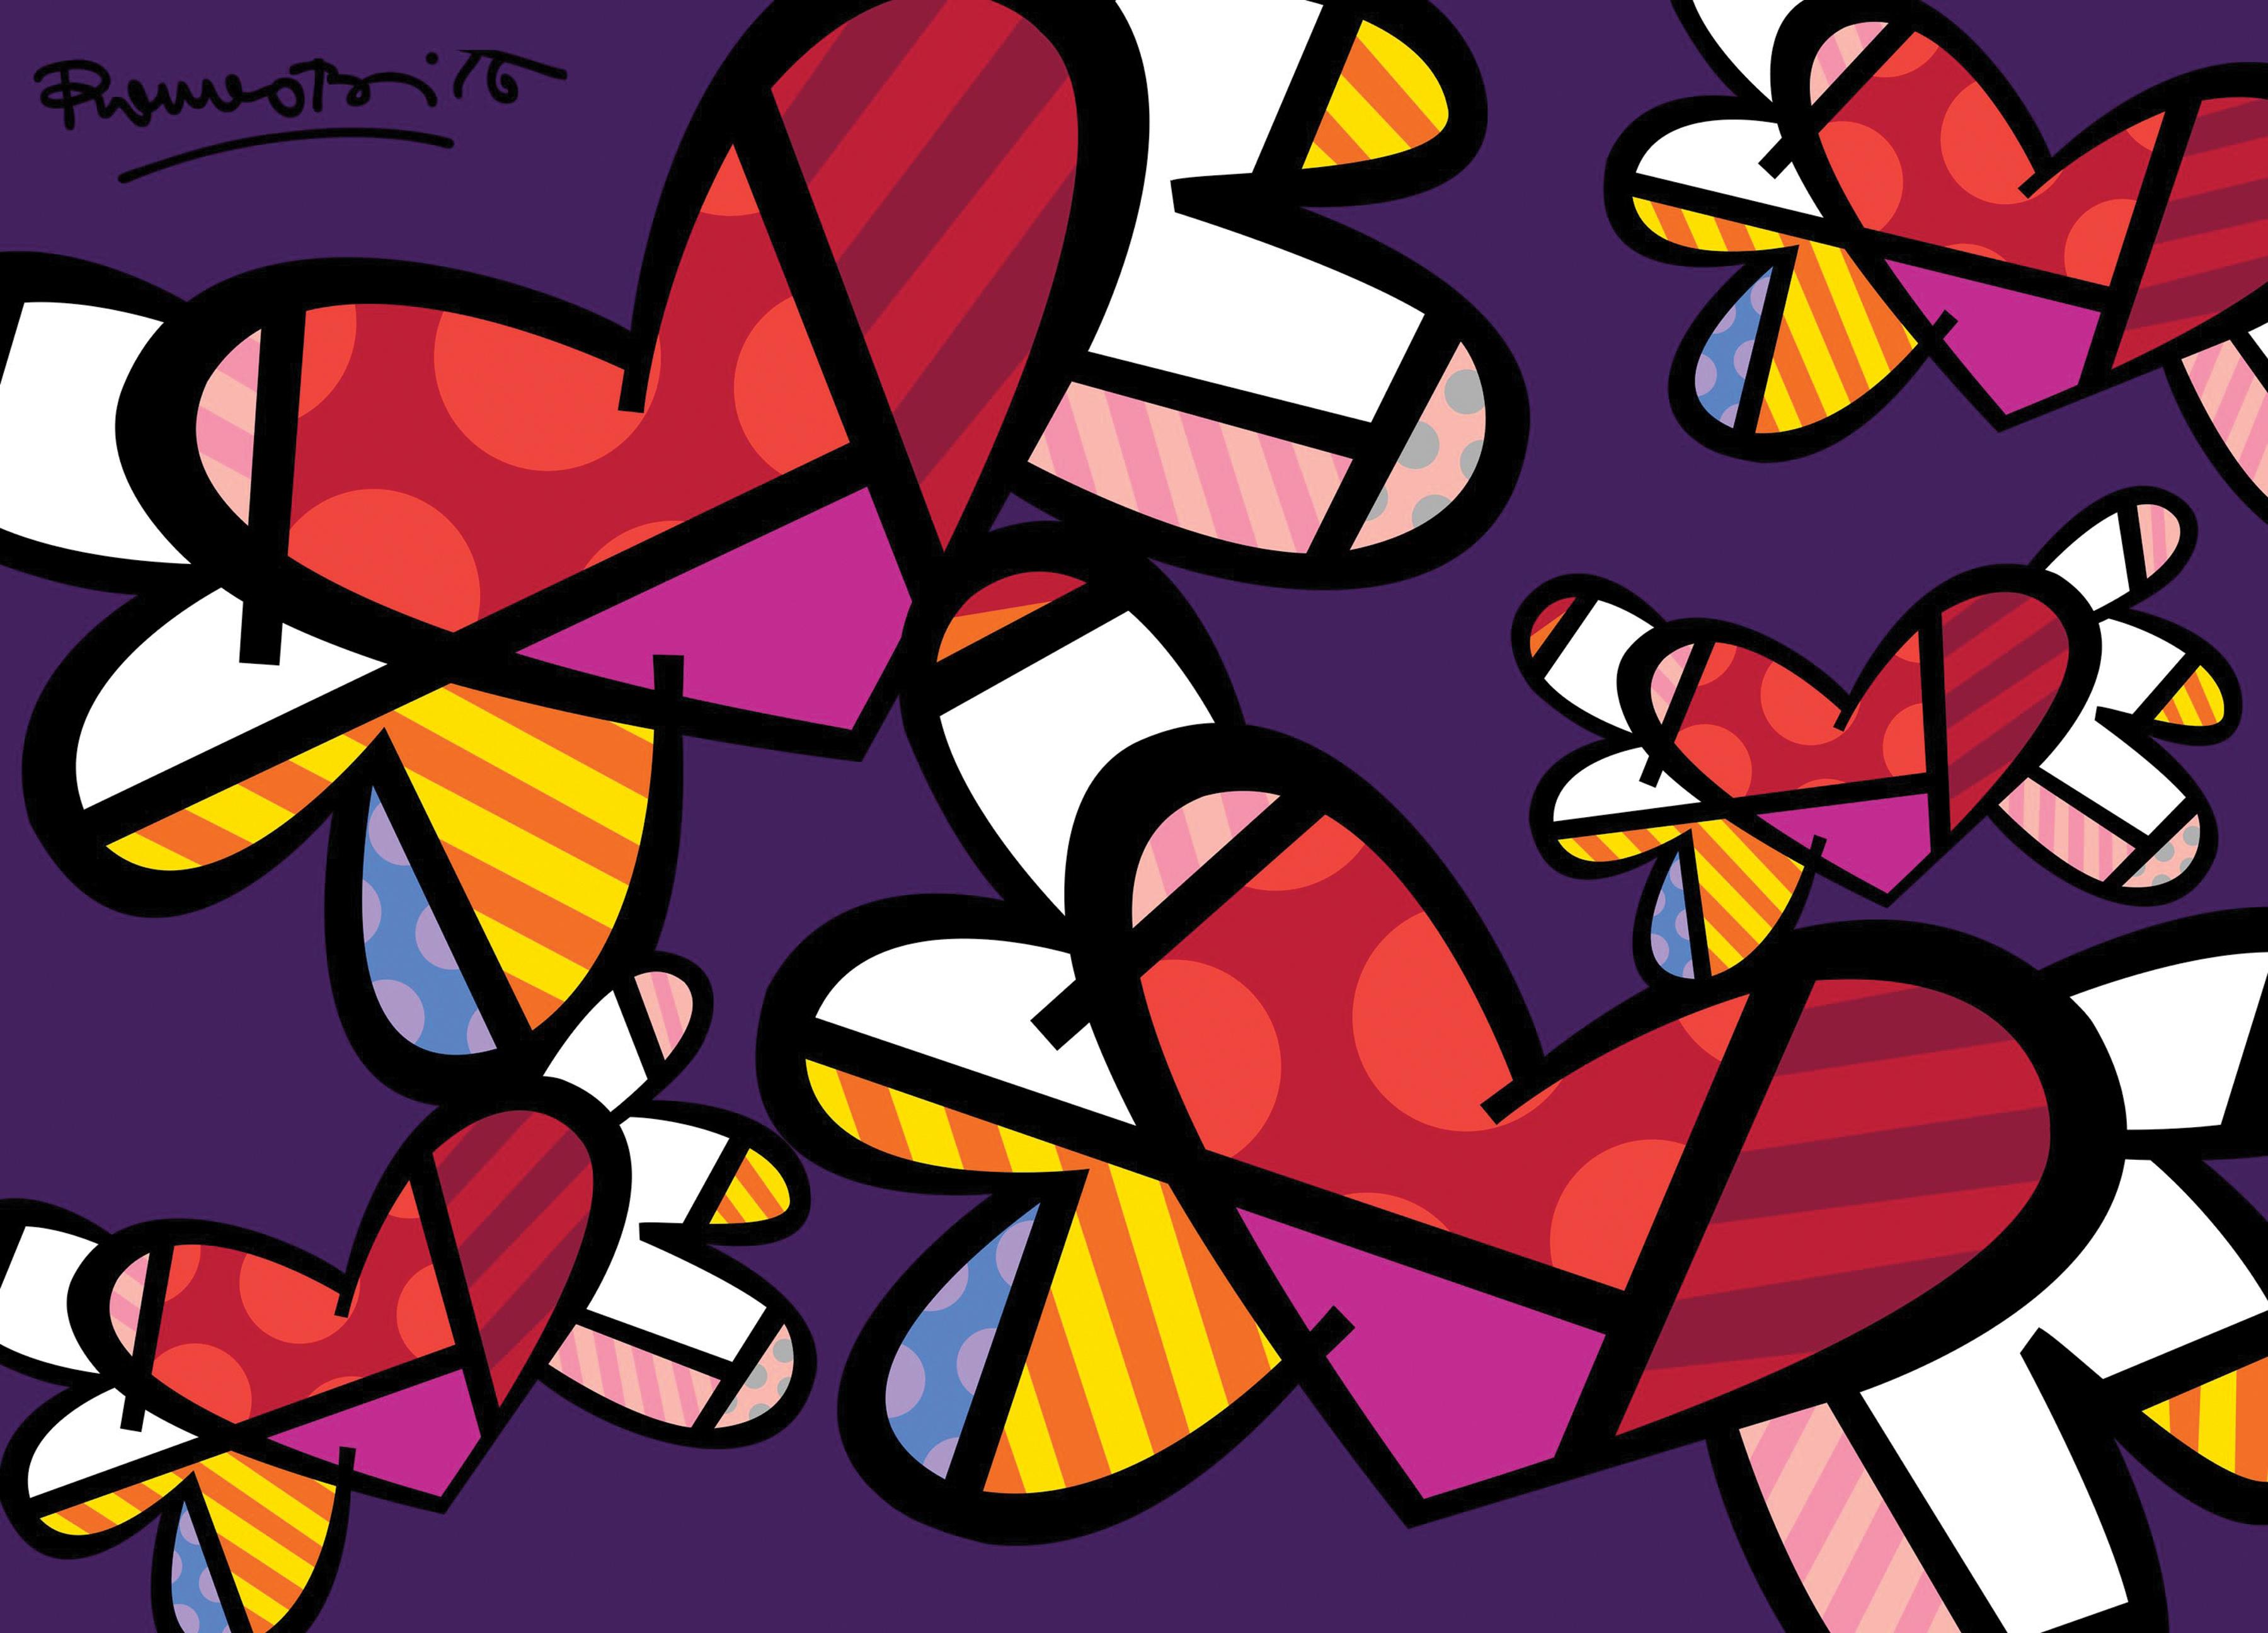 Arts visuels Romeo Britto